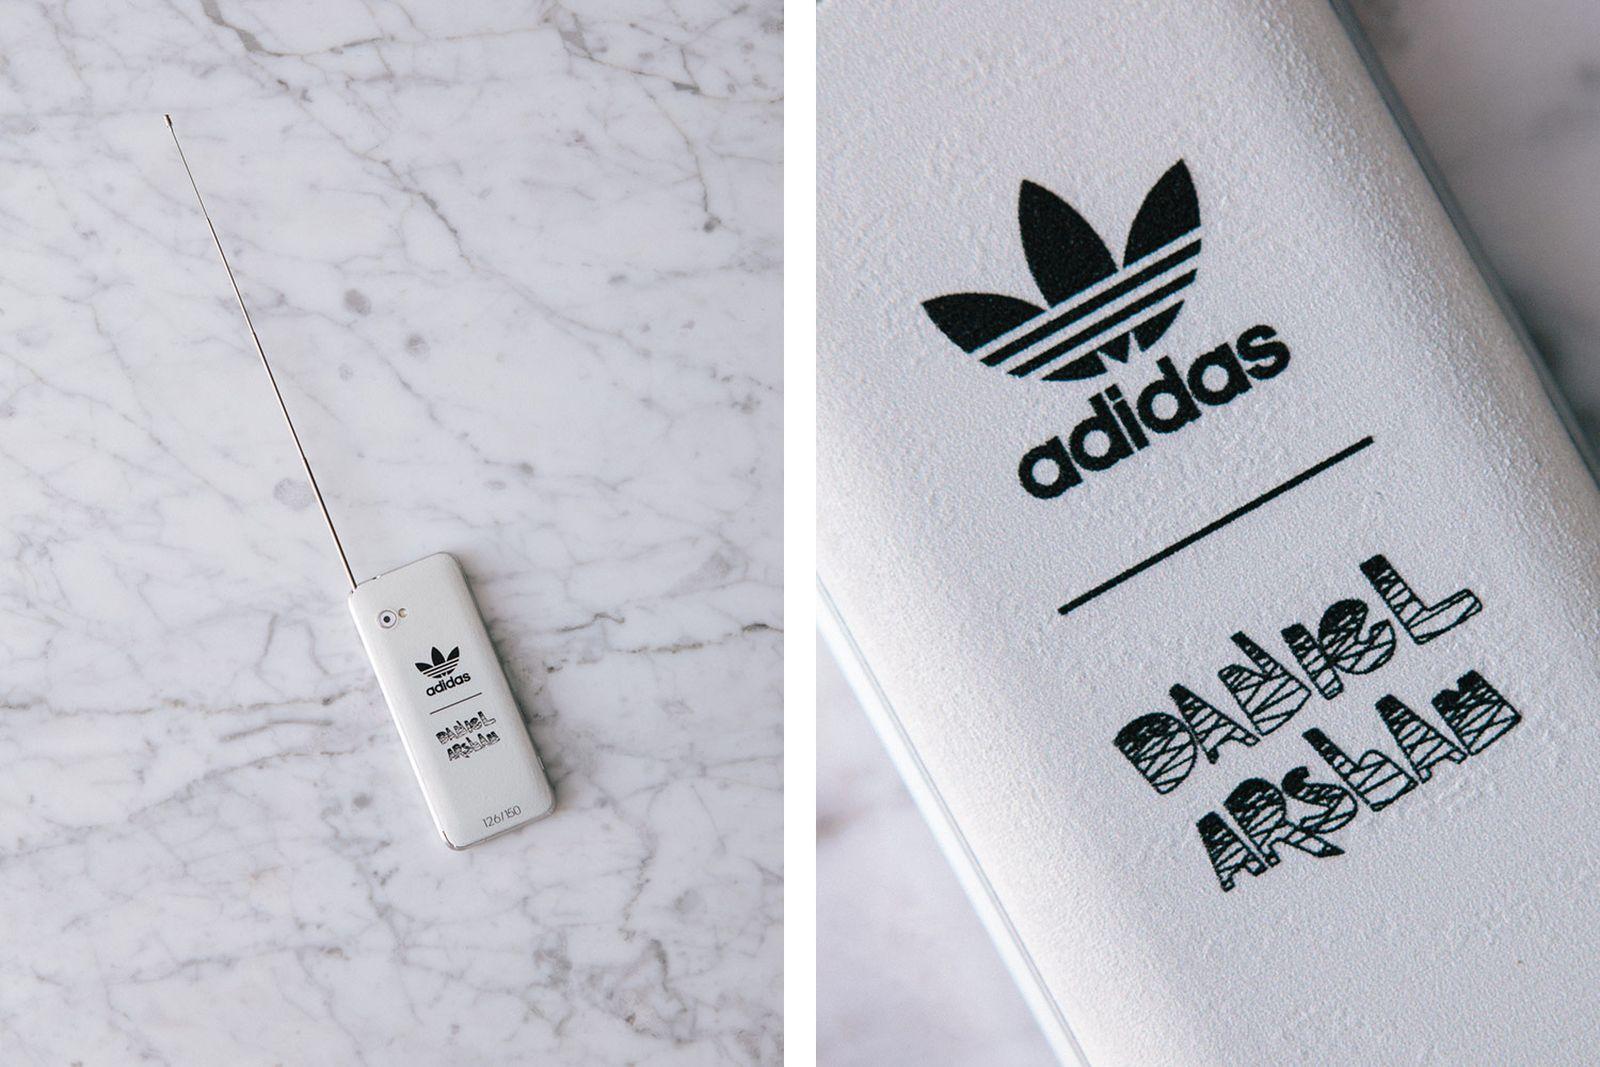 Adidas-Originals-Daniel-Arsham-Highsnobiety-03